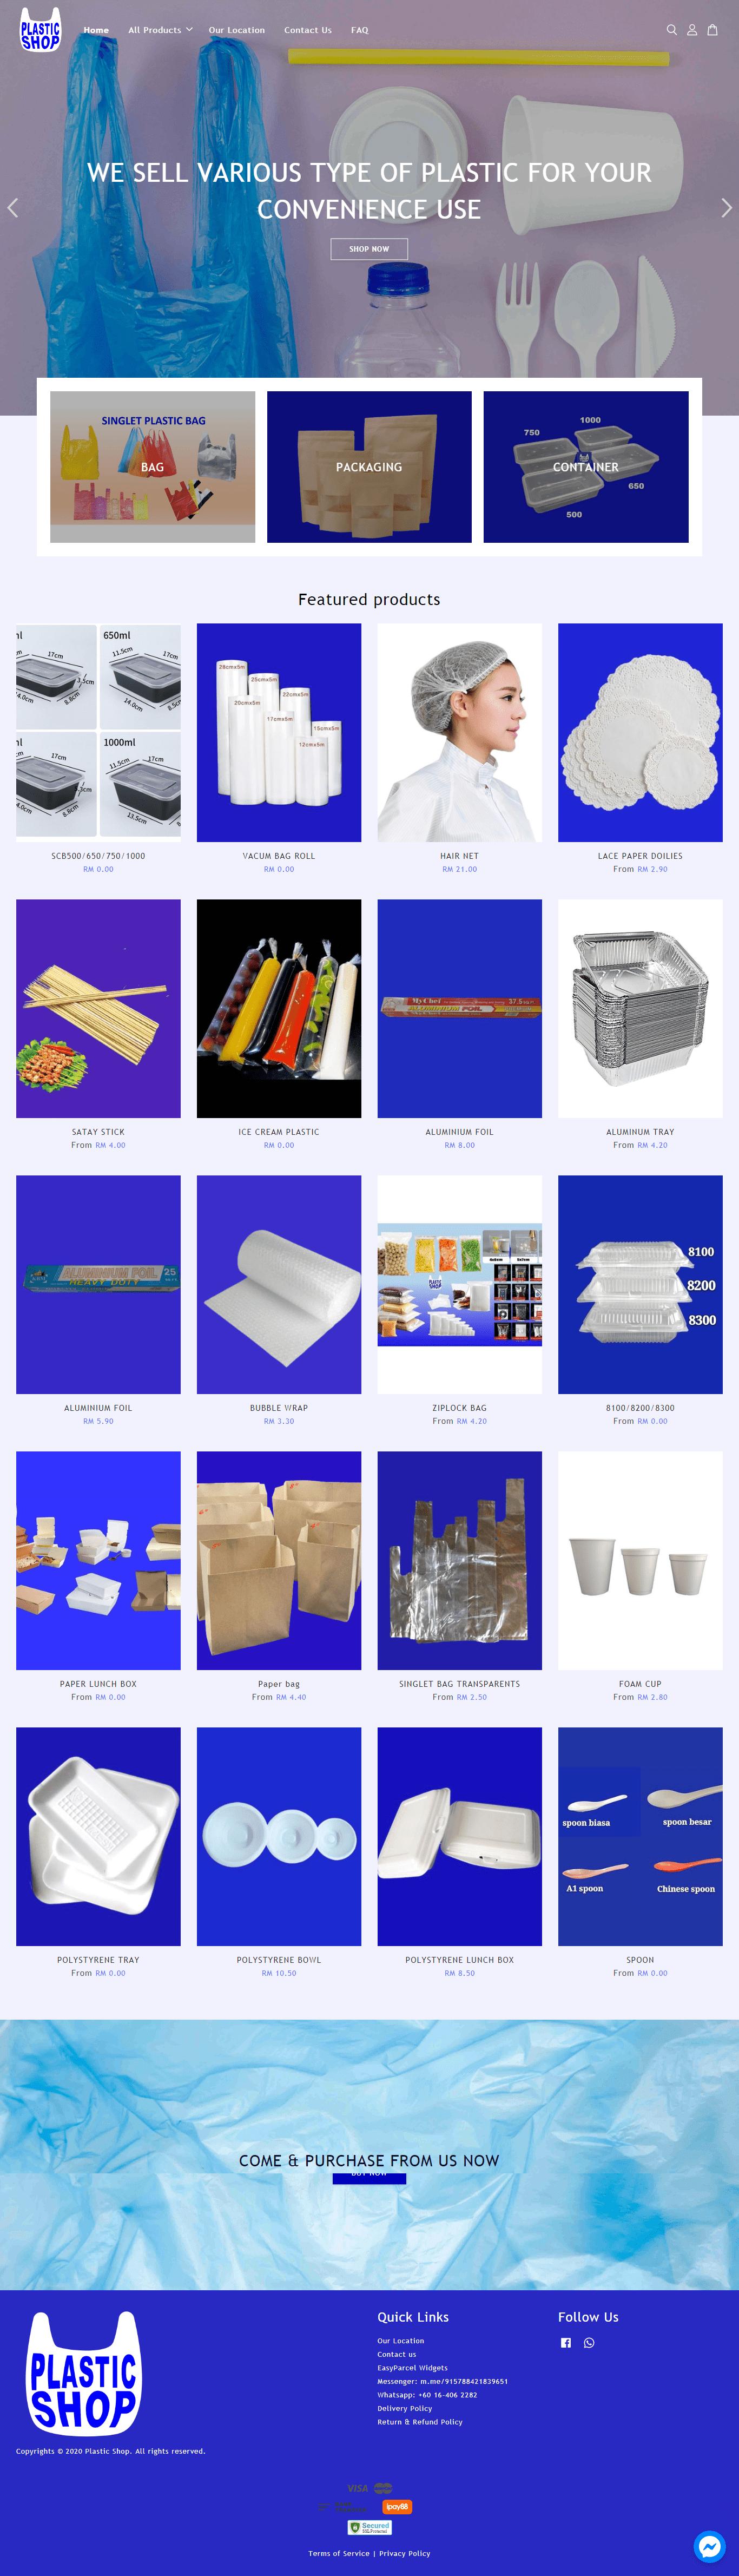 Plastic Shop